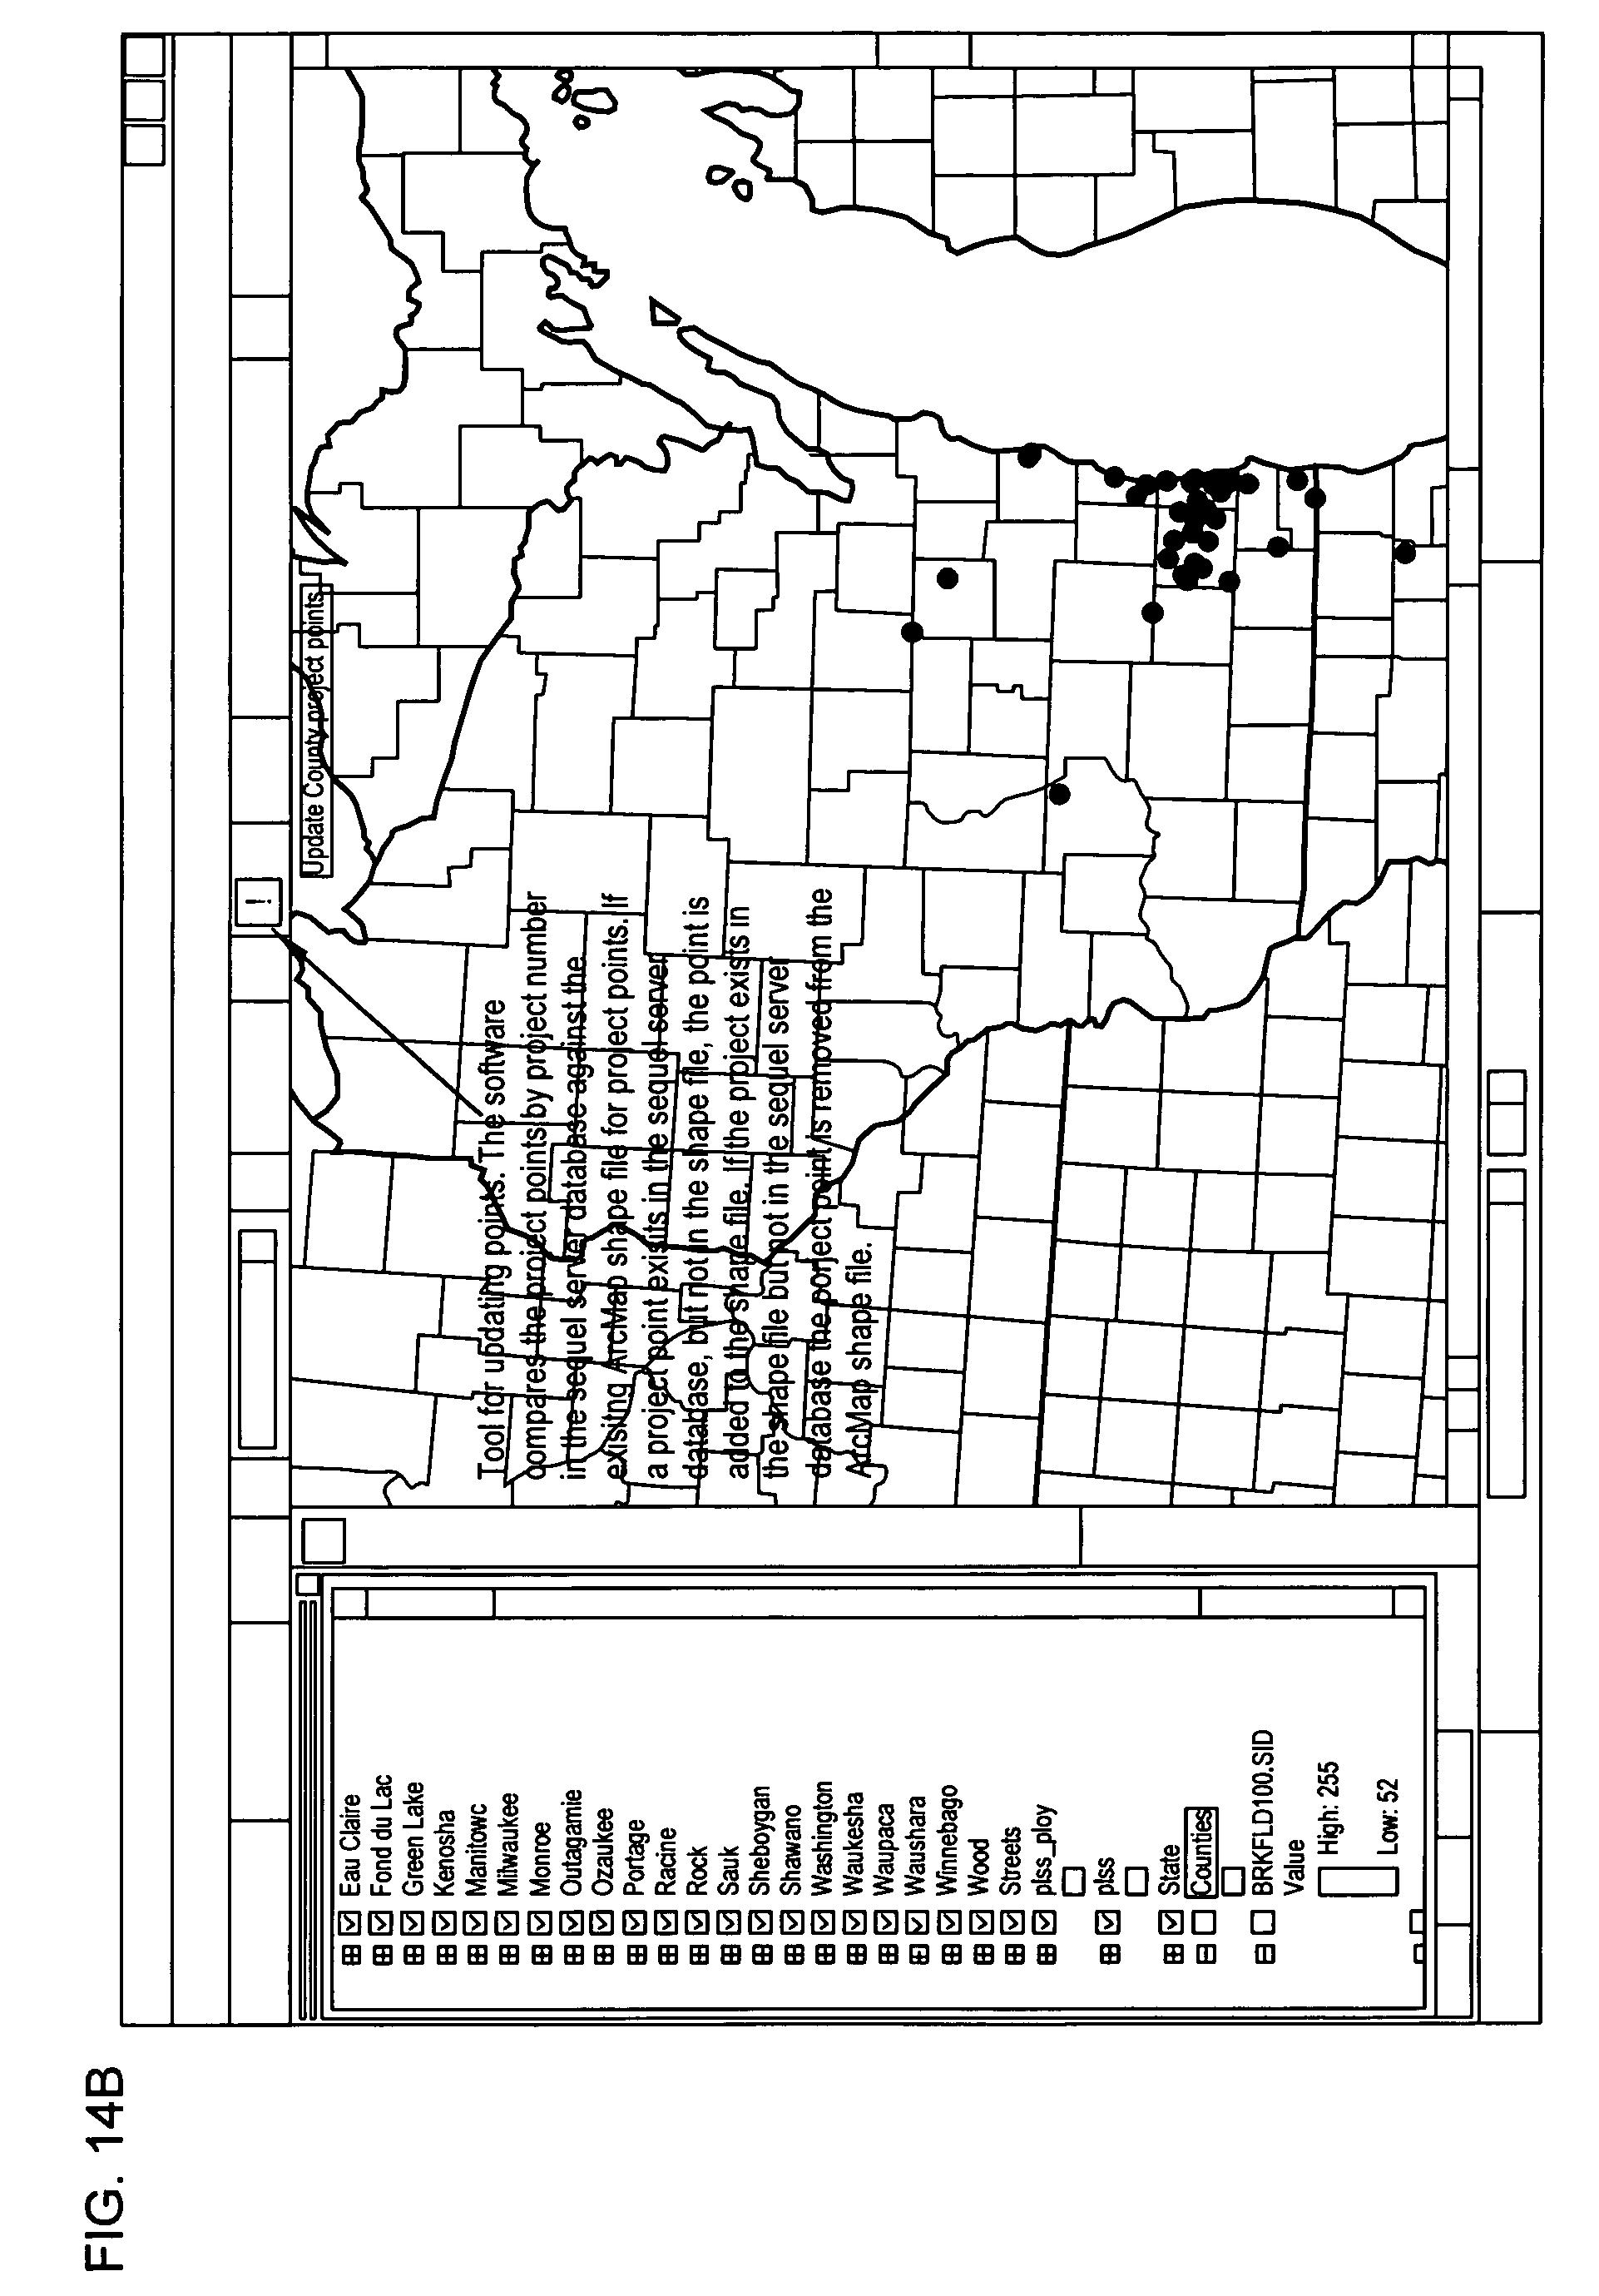 us national grid coordinate system